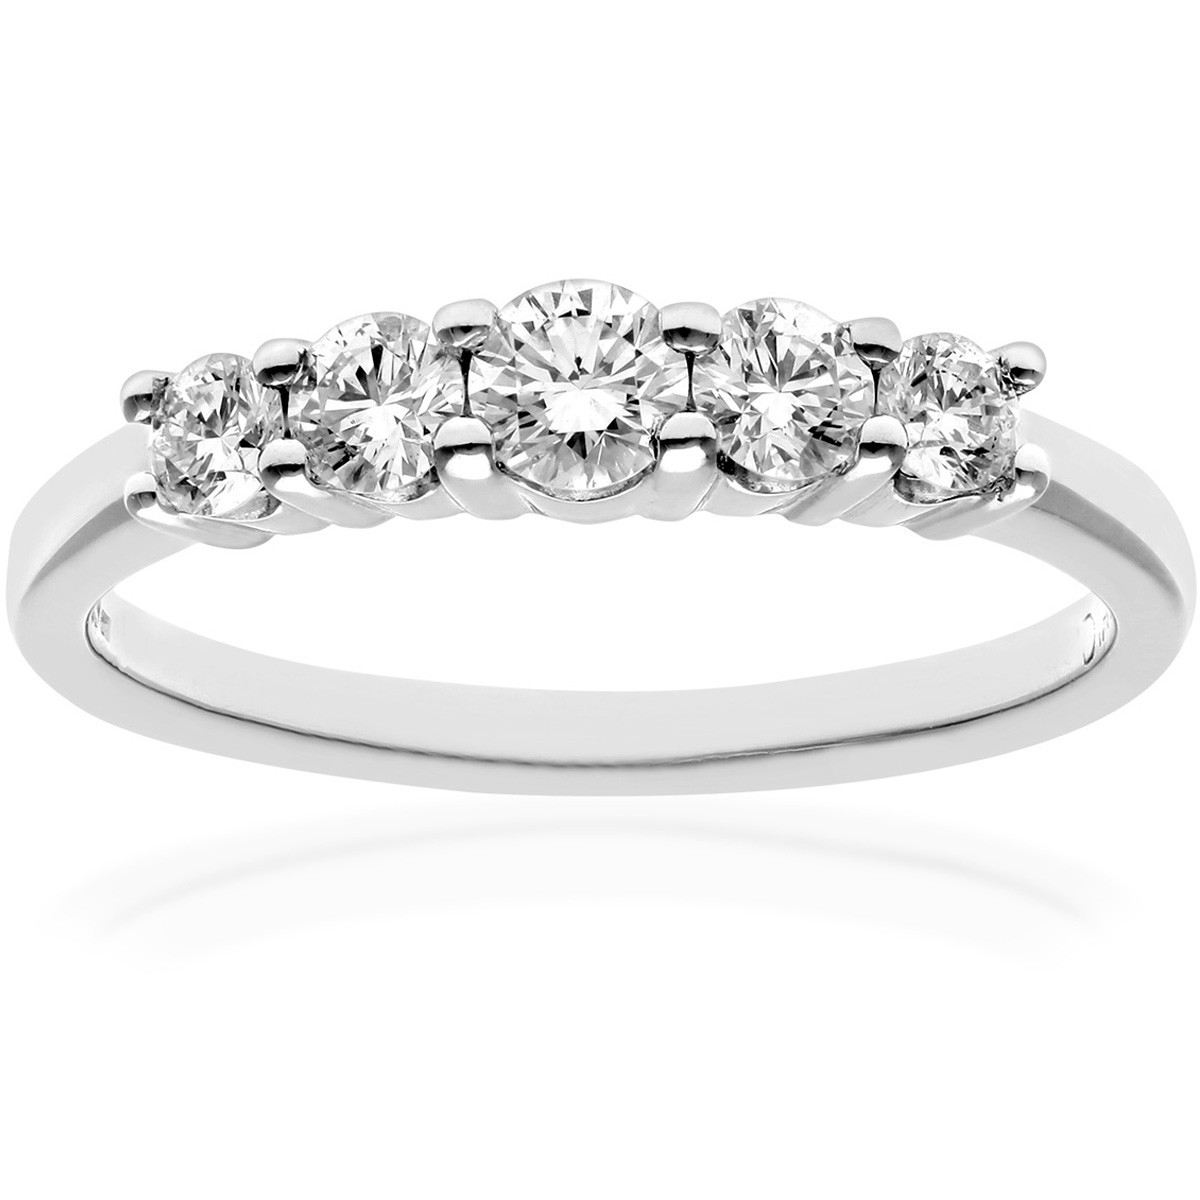 18CT WHITE GOLD 0.50CT DIAMOND 5 STONE GRADUATE  ETERNITY RING